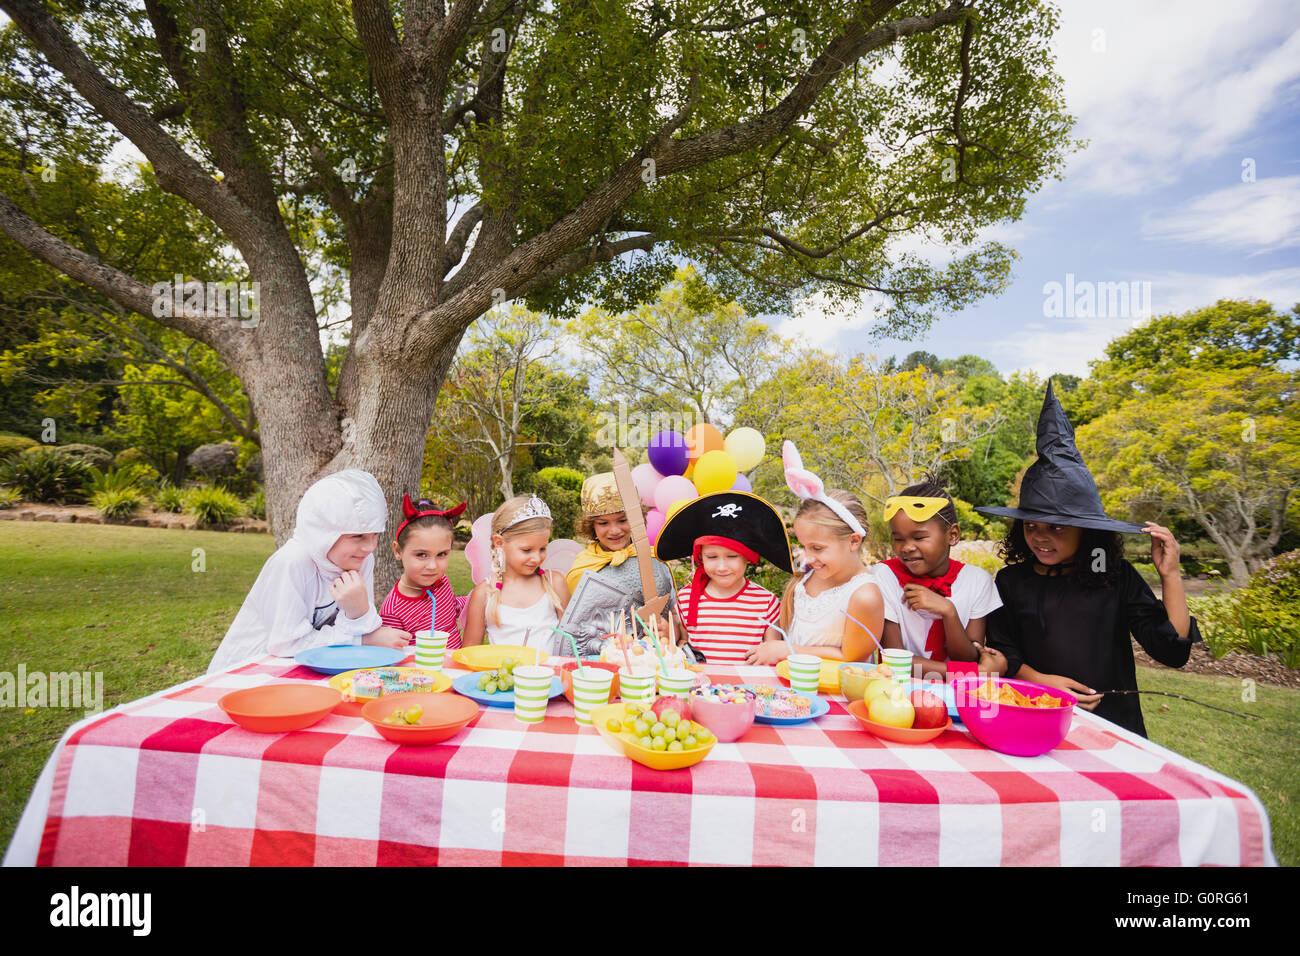 Children wearing costume having fun during birthday party - Stock Image